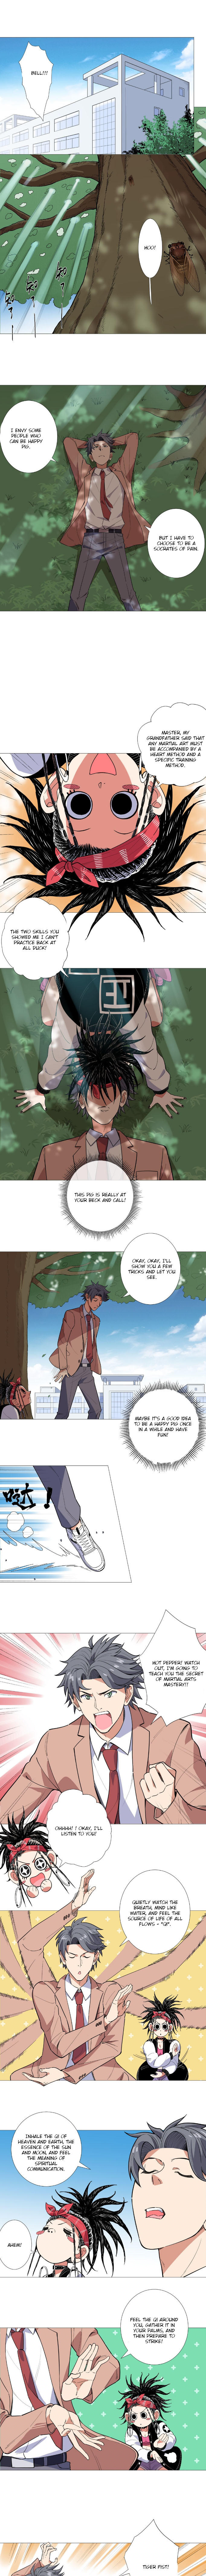 The Supreme Almighty Master Chapter 19 page 5 - Mangakakalots.com